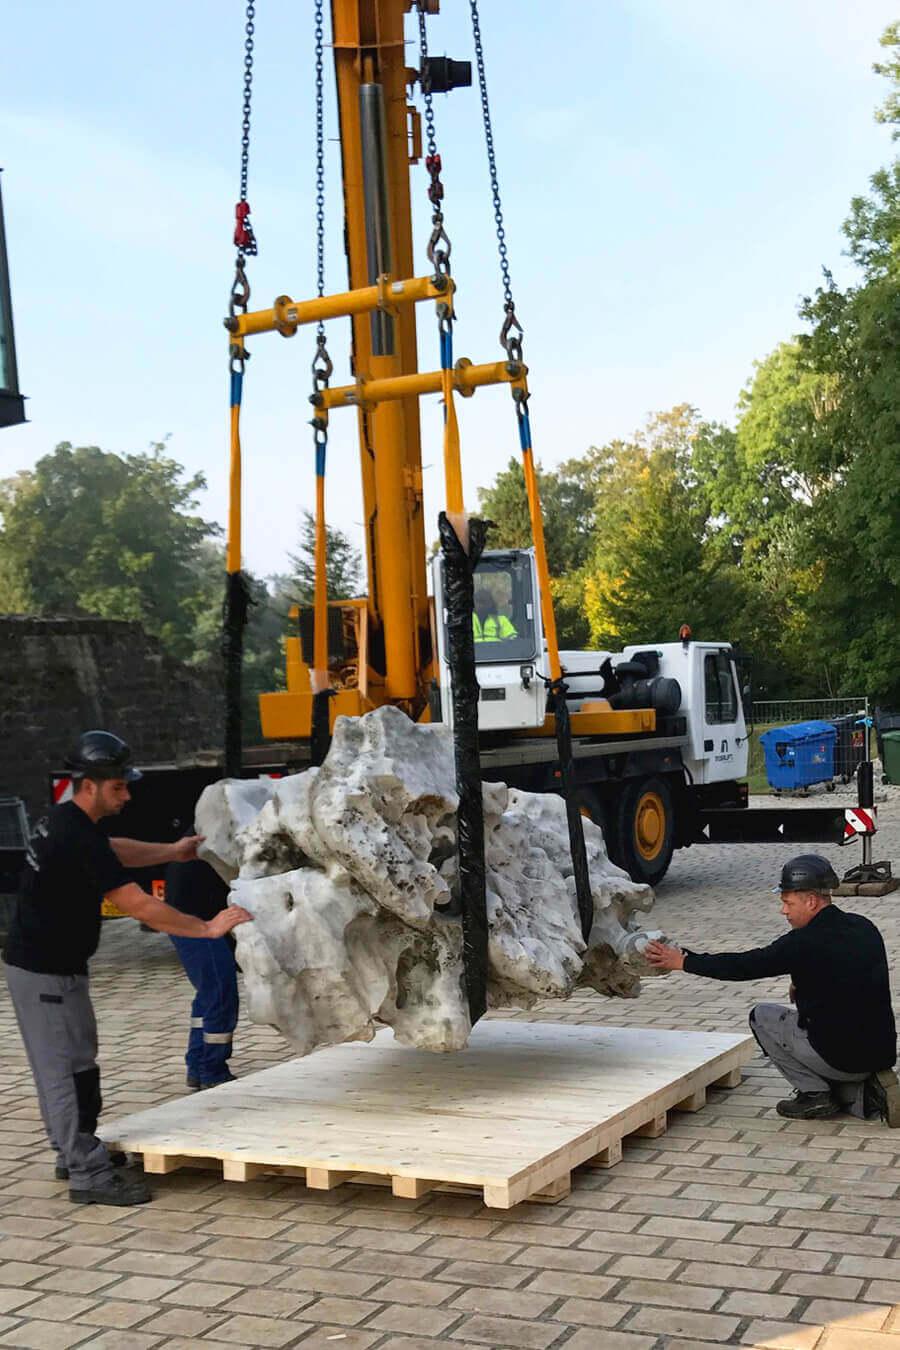 allpack-services-handlin-a-4-2-tonne-stone